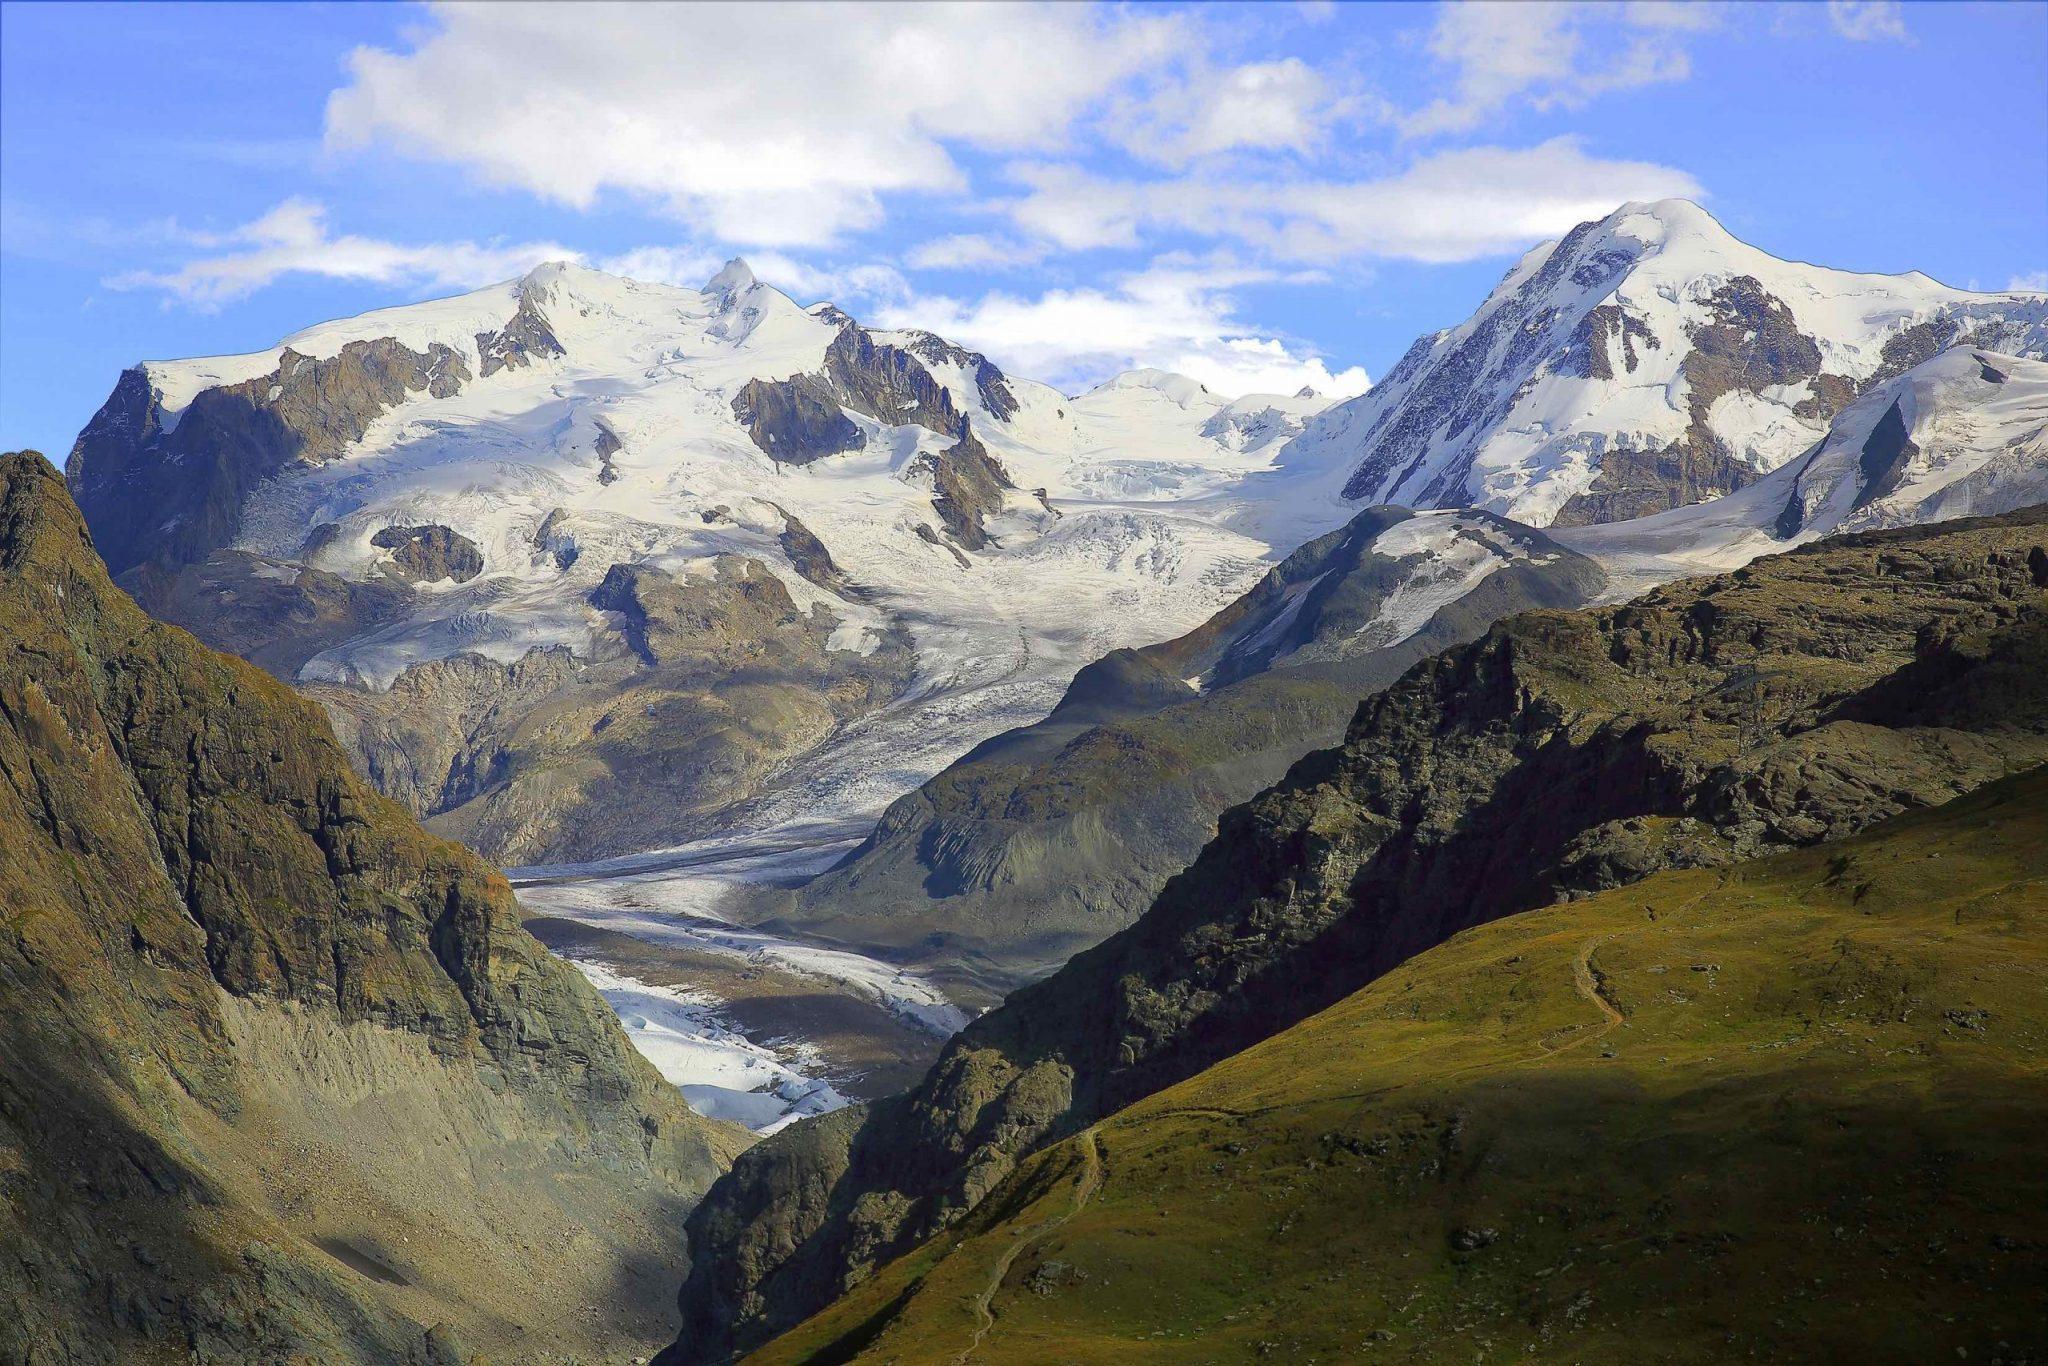 Idyllic Monte Rosa massif, Gorner glacier crevasses dramatic sunrise, Swiss Alps